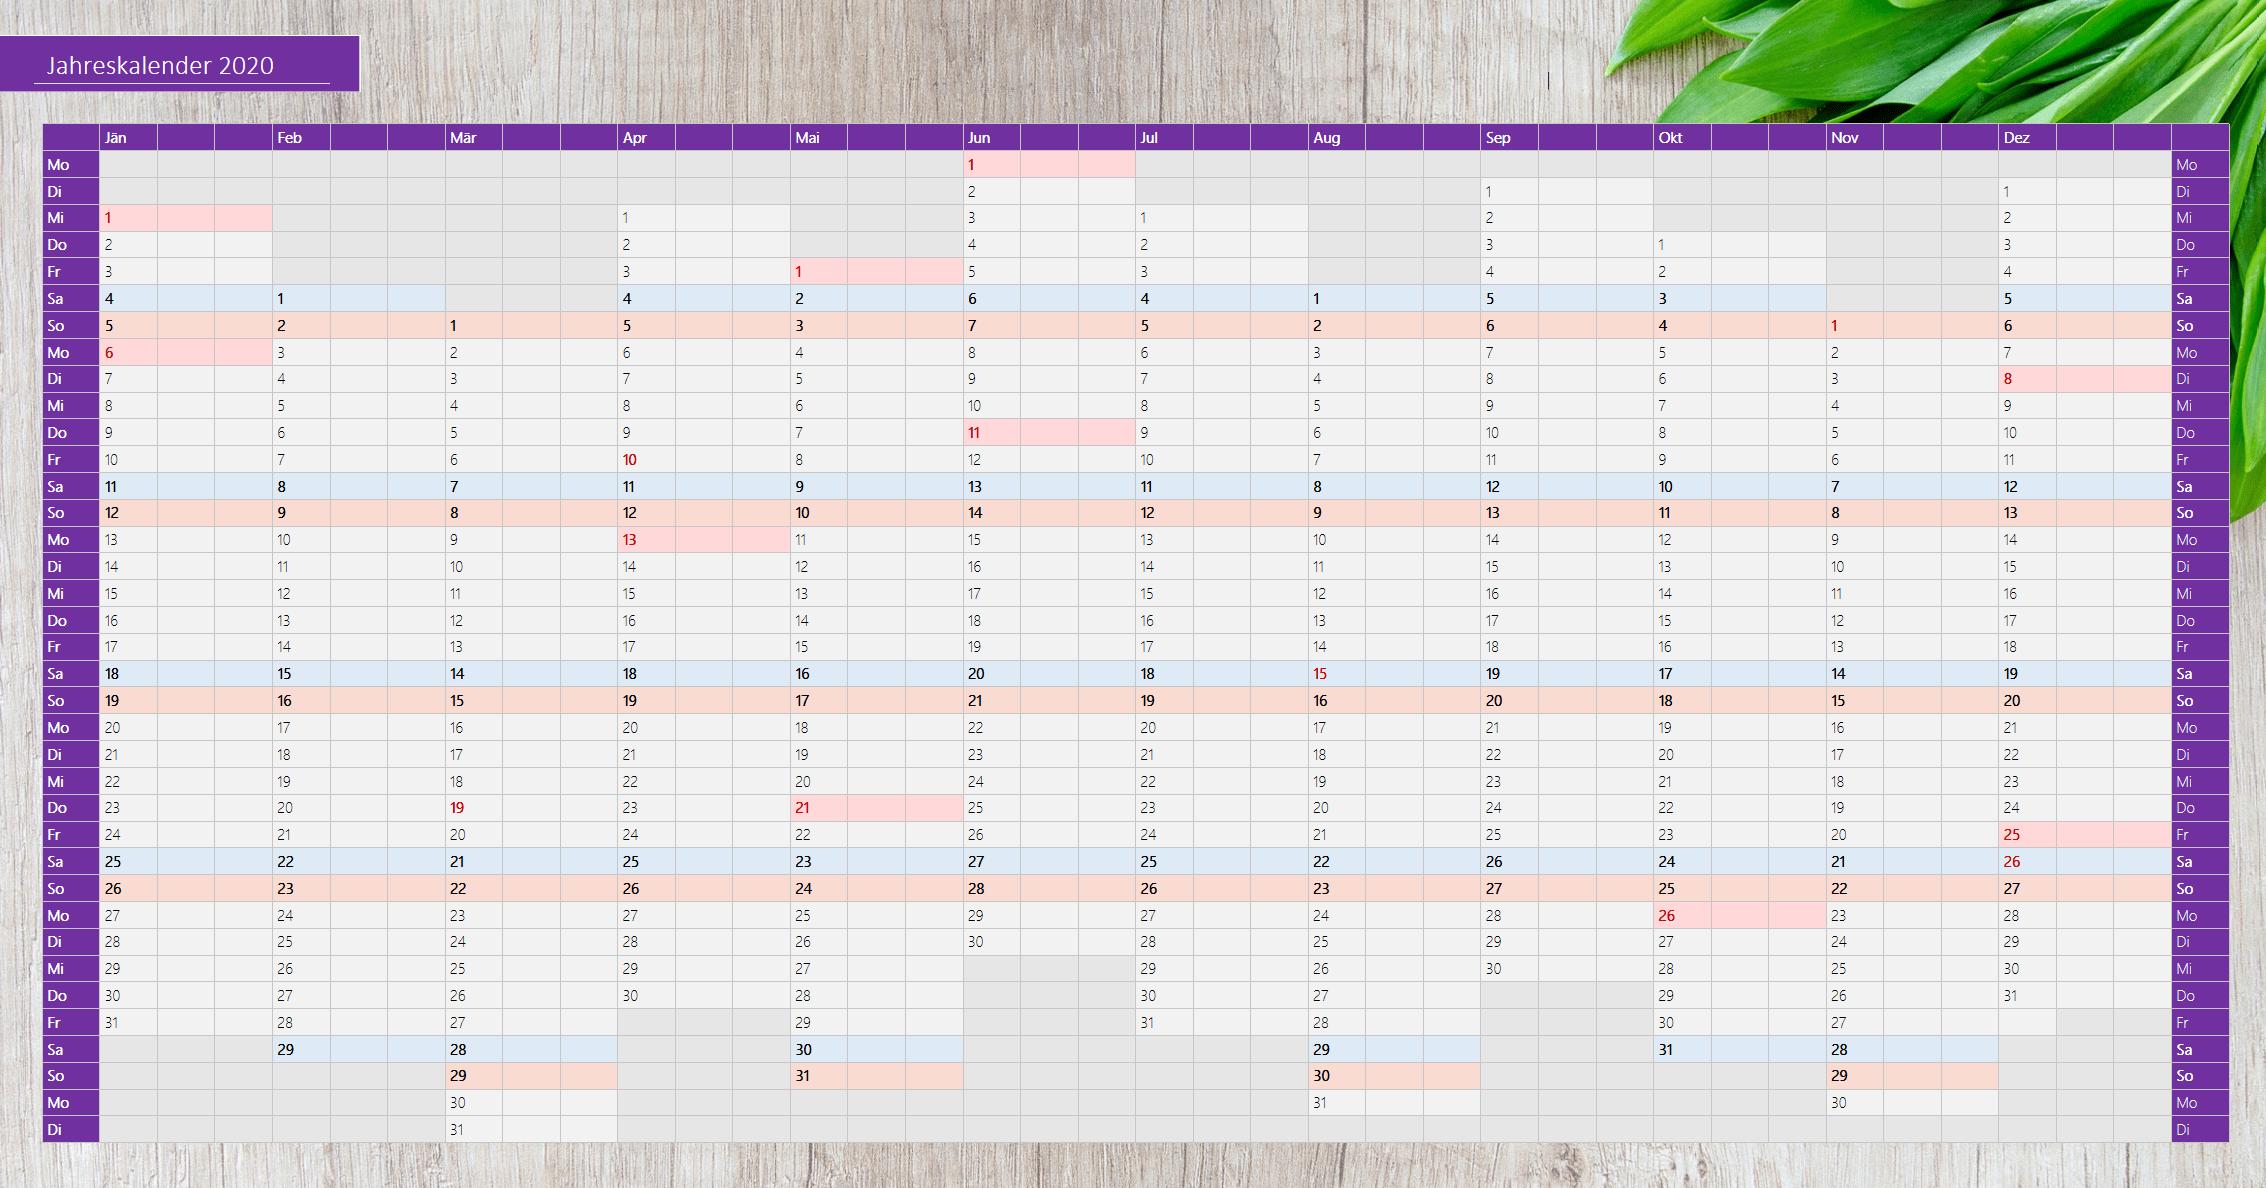 OneNote Jahreskalendar 2020